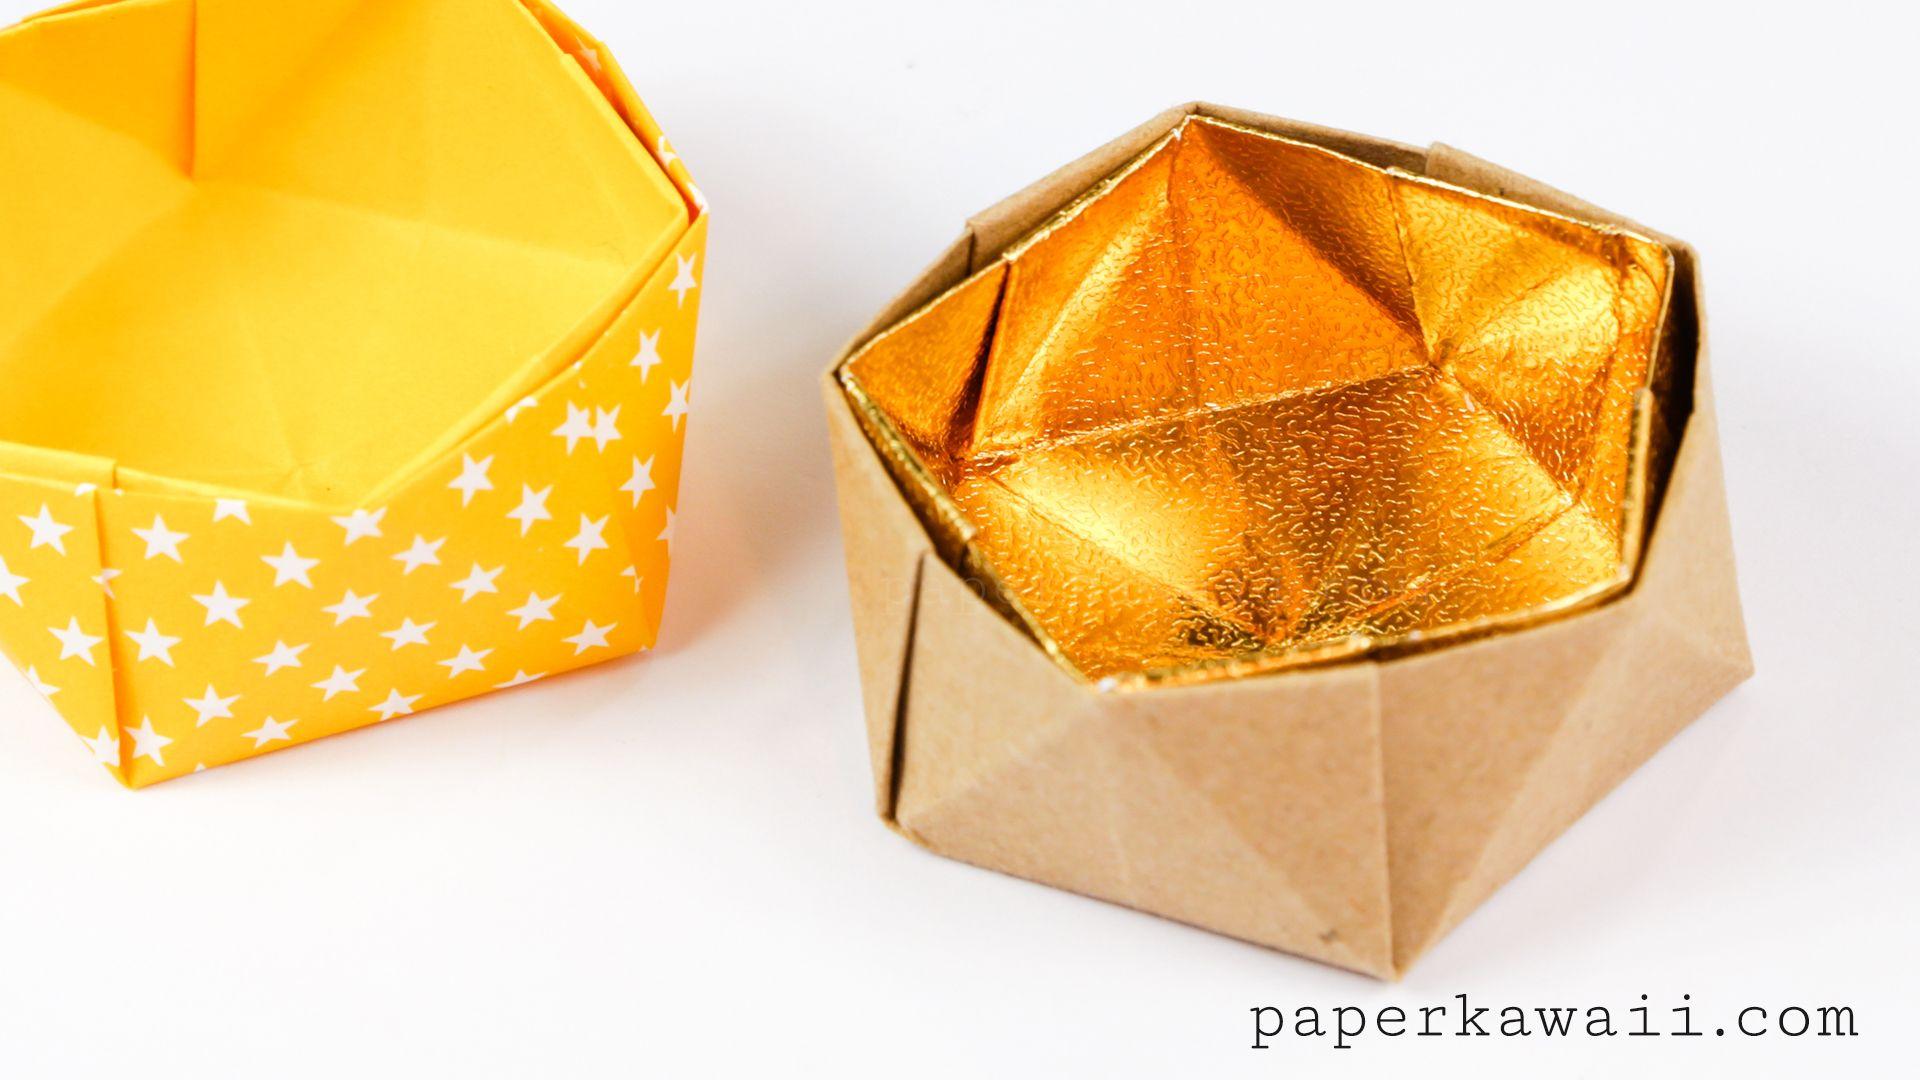 Geometric Origami Bowl Instructions Geometric Origami Origami And